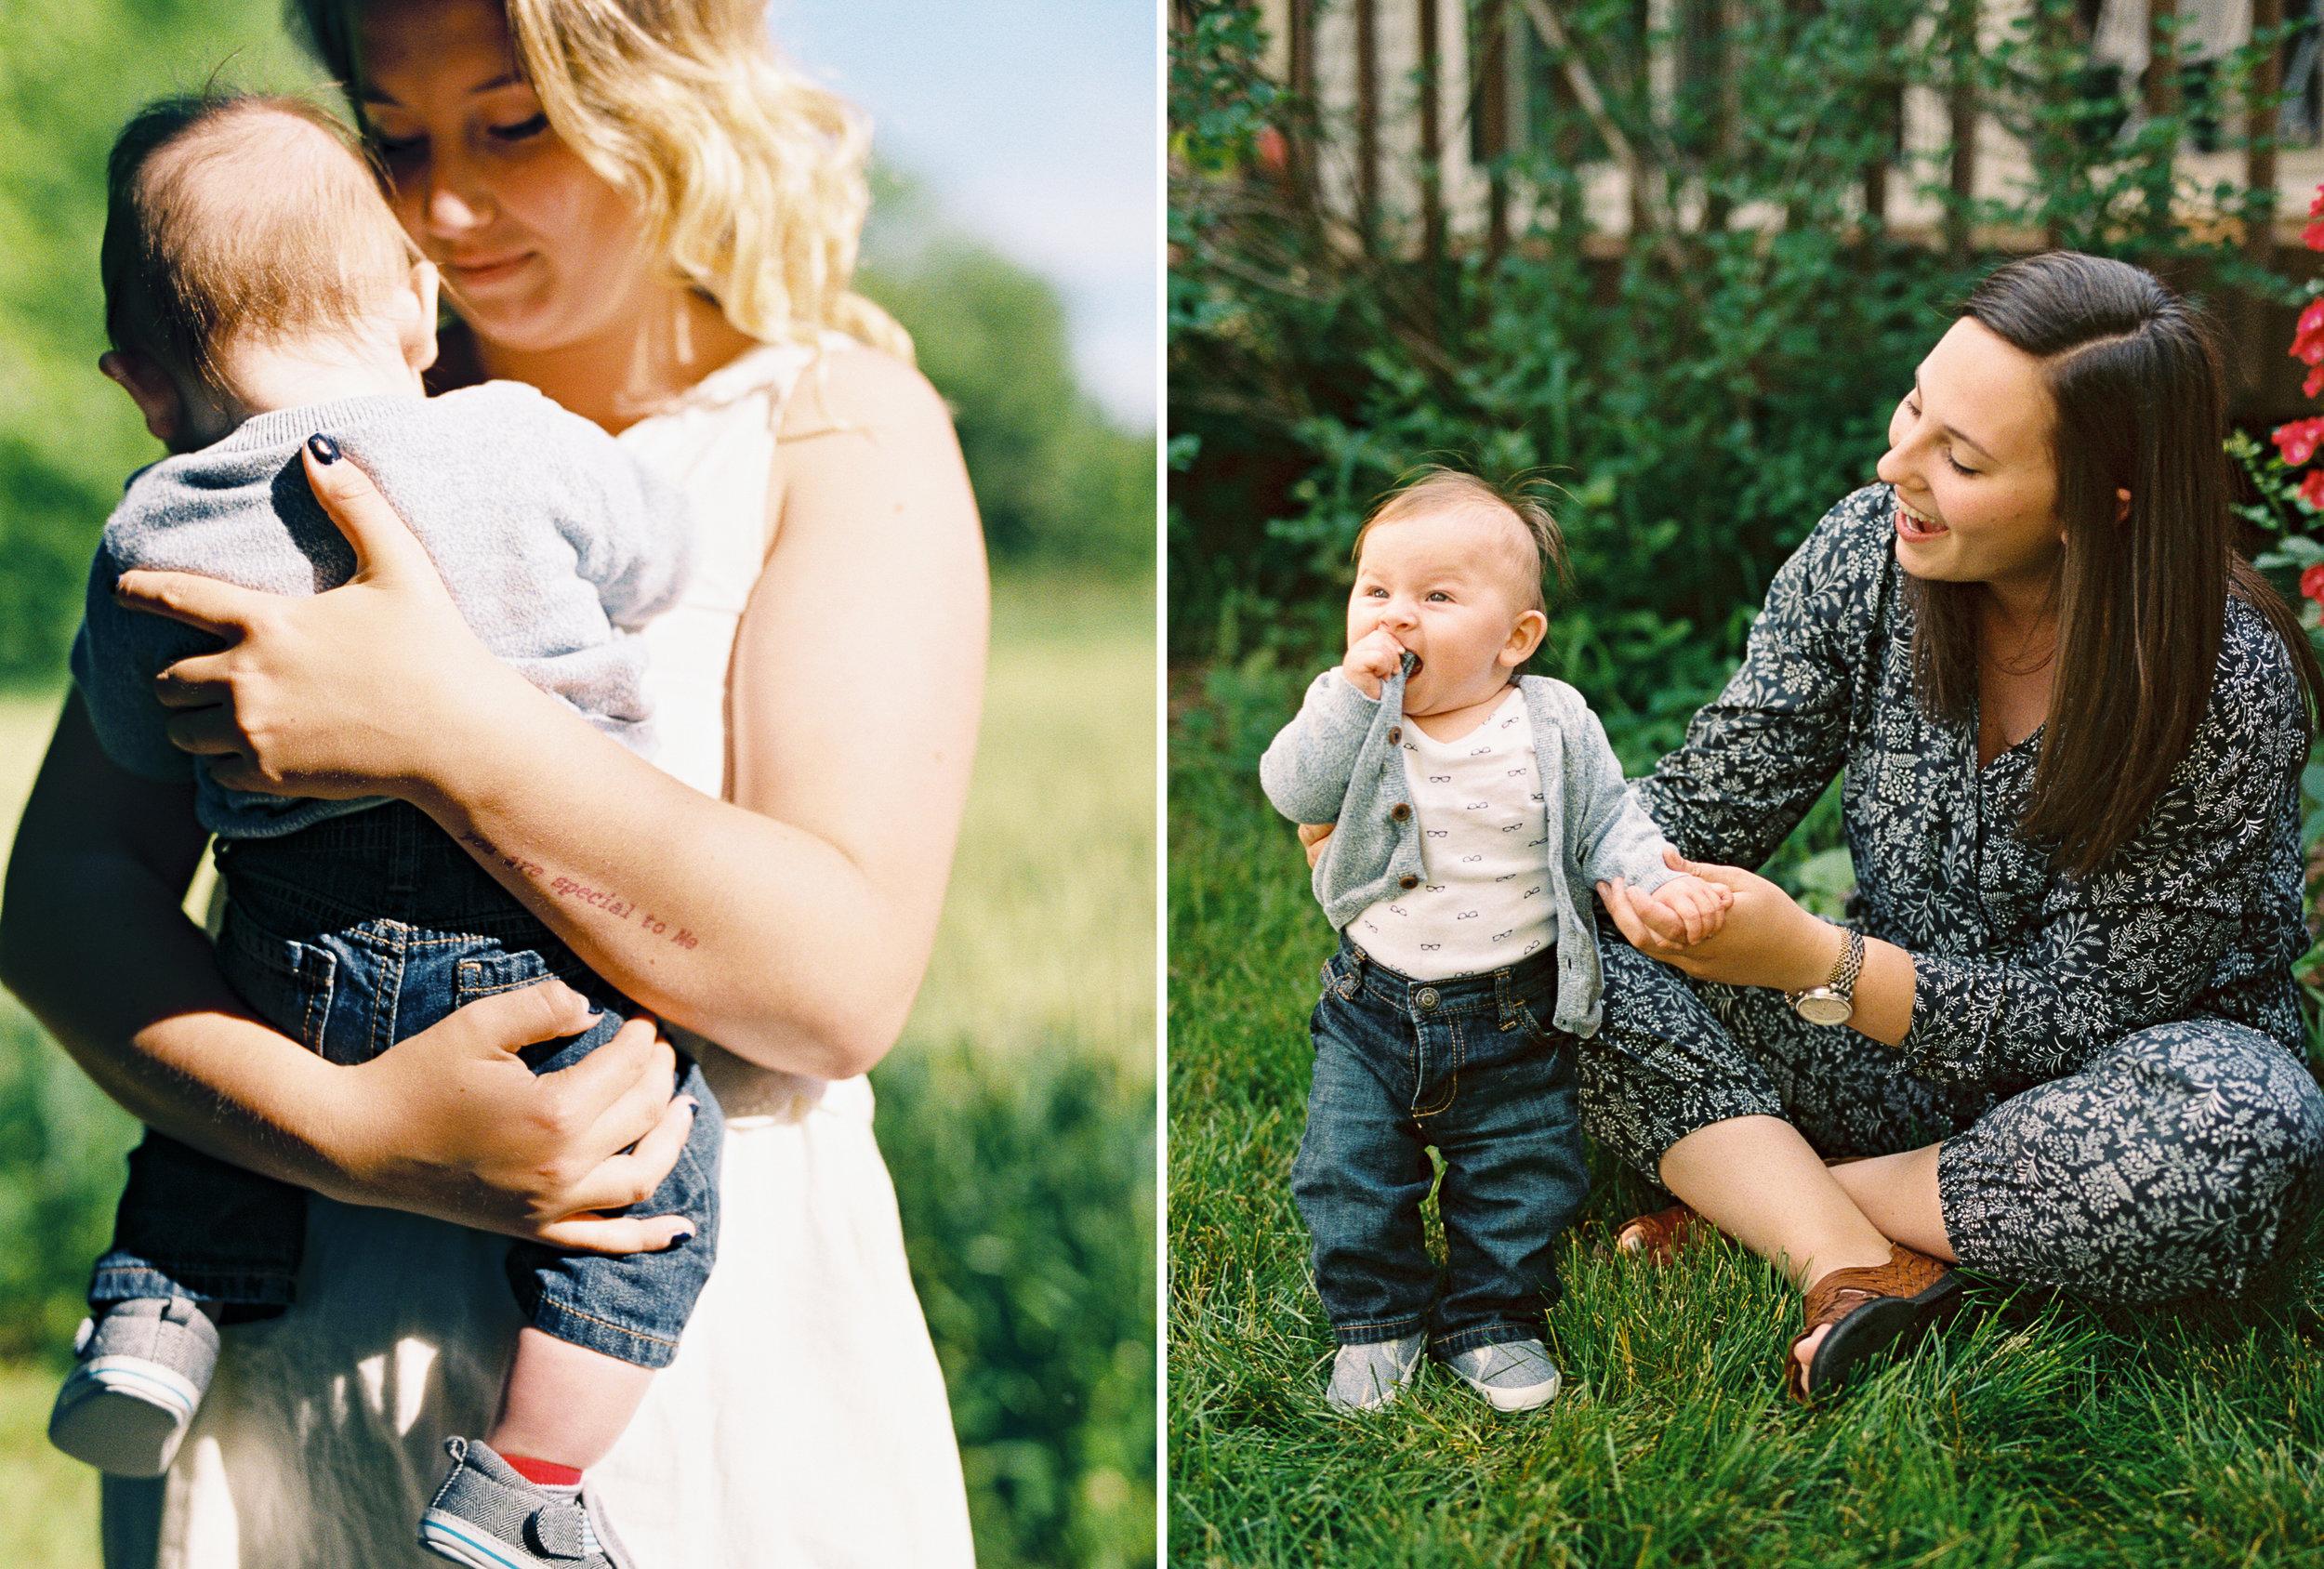 illinois family photographer Catie Scott Studio Film contax 645_3.jpg